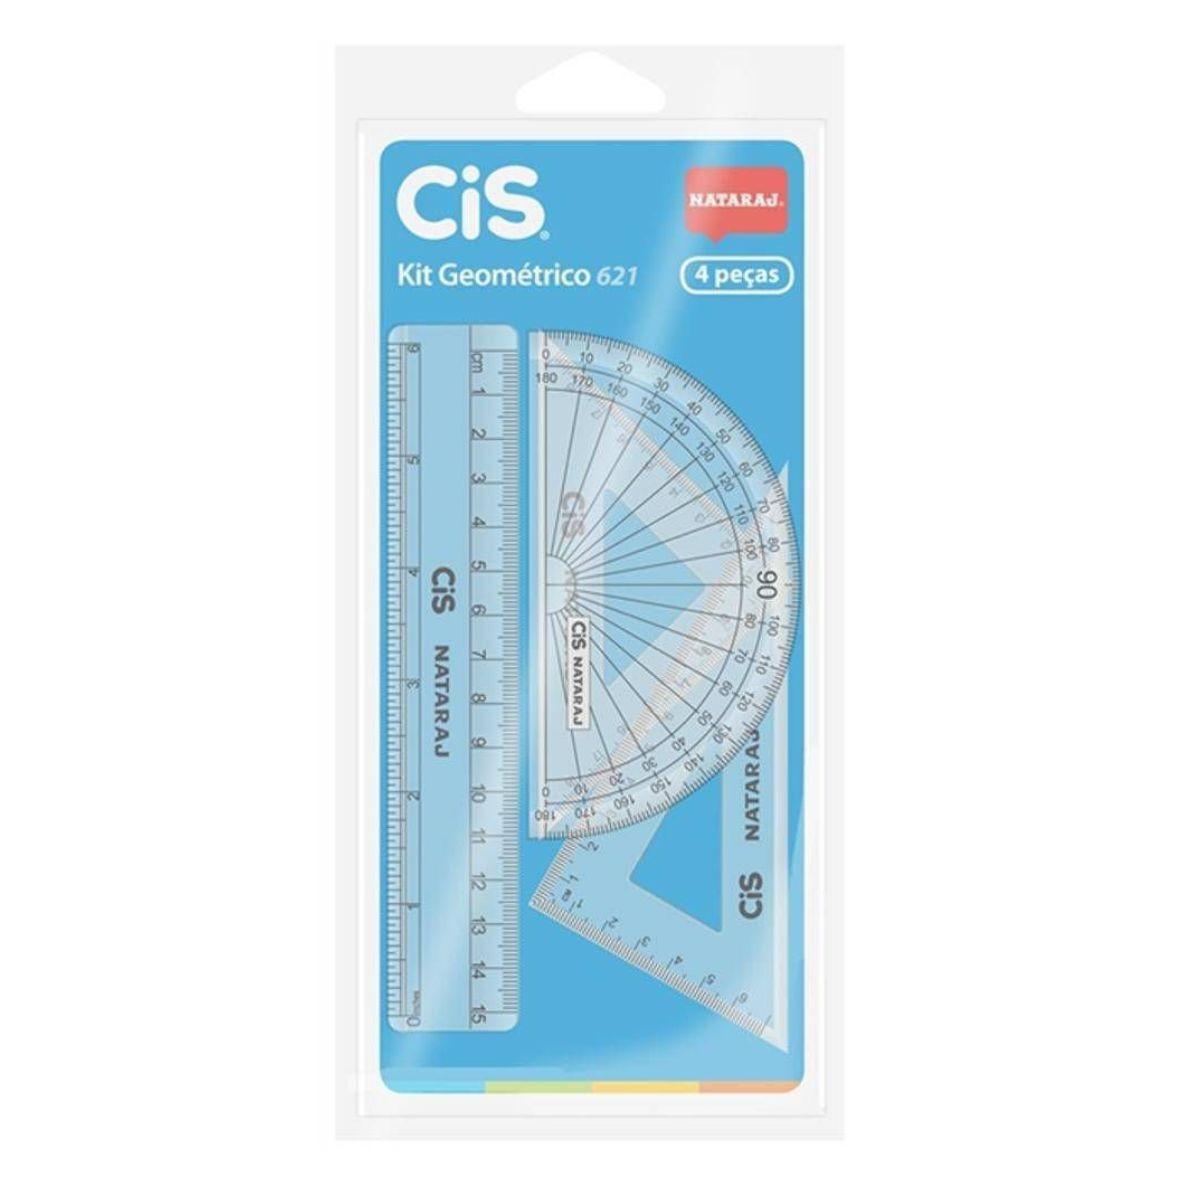 Kit Réguas Geométricas 4 Peças Transparente - CIS